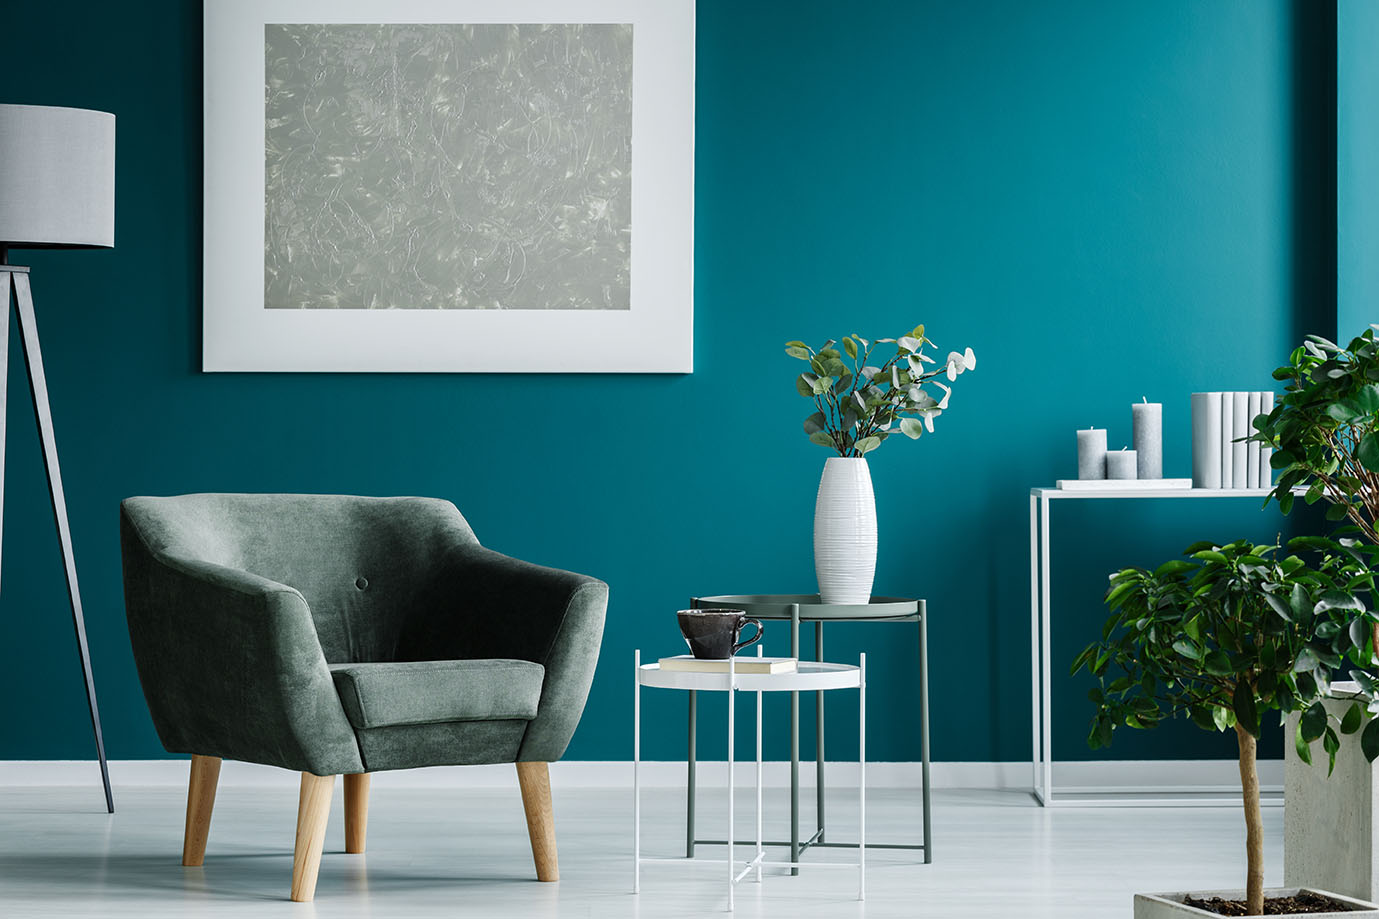 Bleu Et Vert Quel Couleur quels rideaux avec un mur bleu canard ?